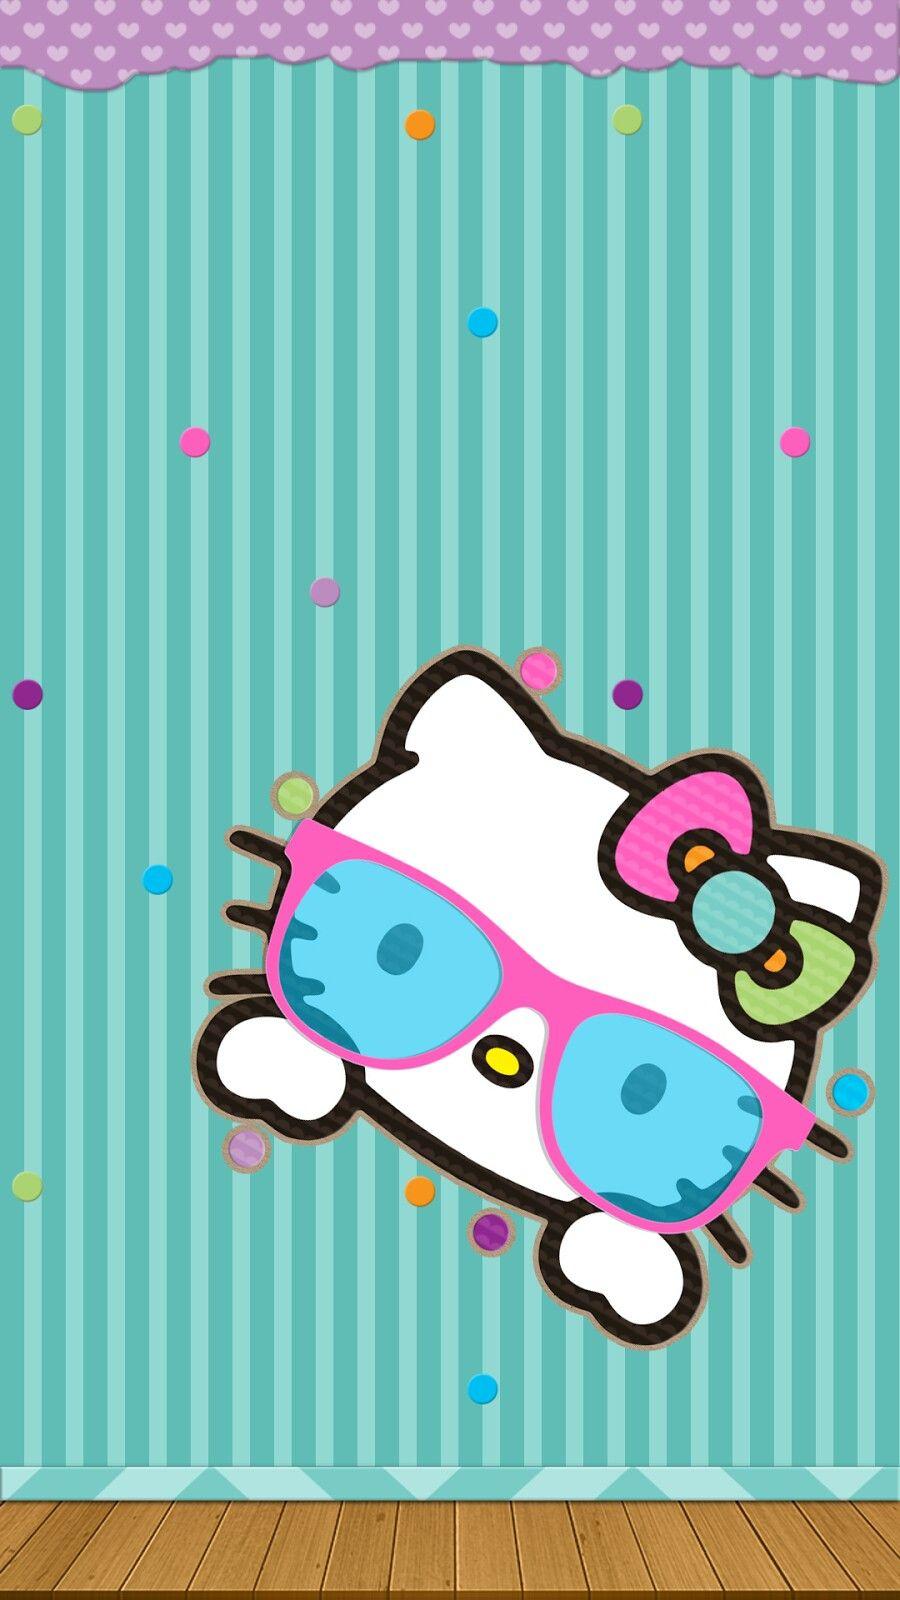 Wonderful Wallpaper Hello Kitty Holiday - 01f7f0e9215e09af1c00e8aefbda7e42  You Should Have_711519.jpg